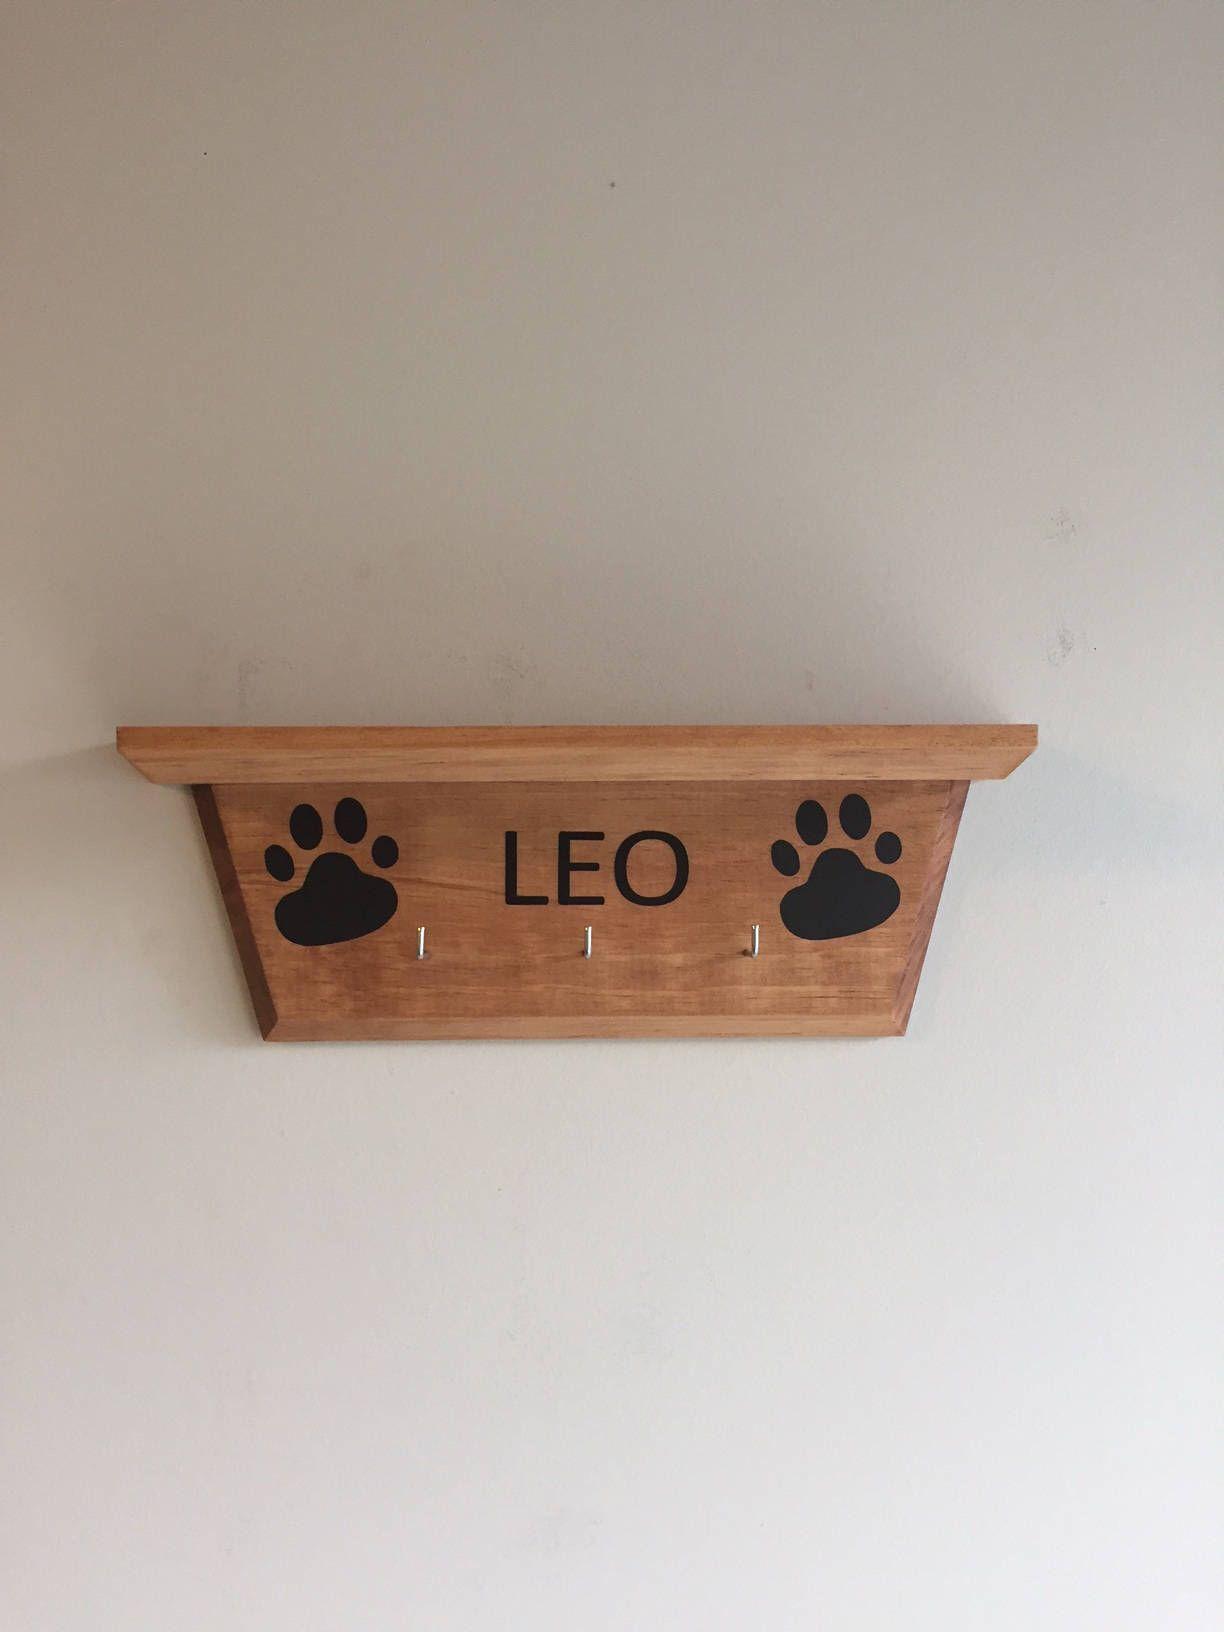 Dog Leash Holder W/ Shelf / Dog Leash Hanger / Custom Dog Leash Hanger /  Custom Dog Leash Holder / Wood Dog Leash Hanger / Dog Leash Storage